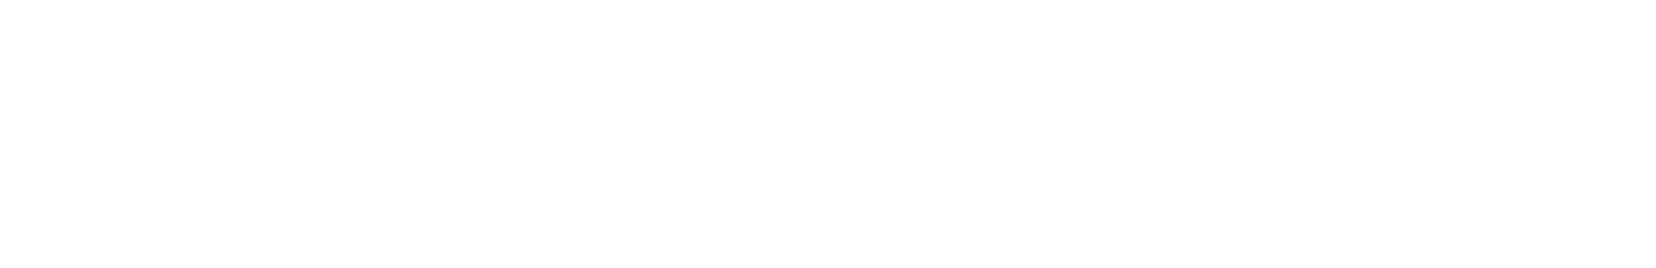 Logotipo biyectiva blanco fondo transparente